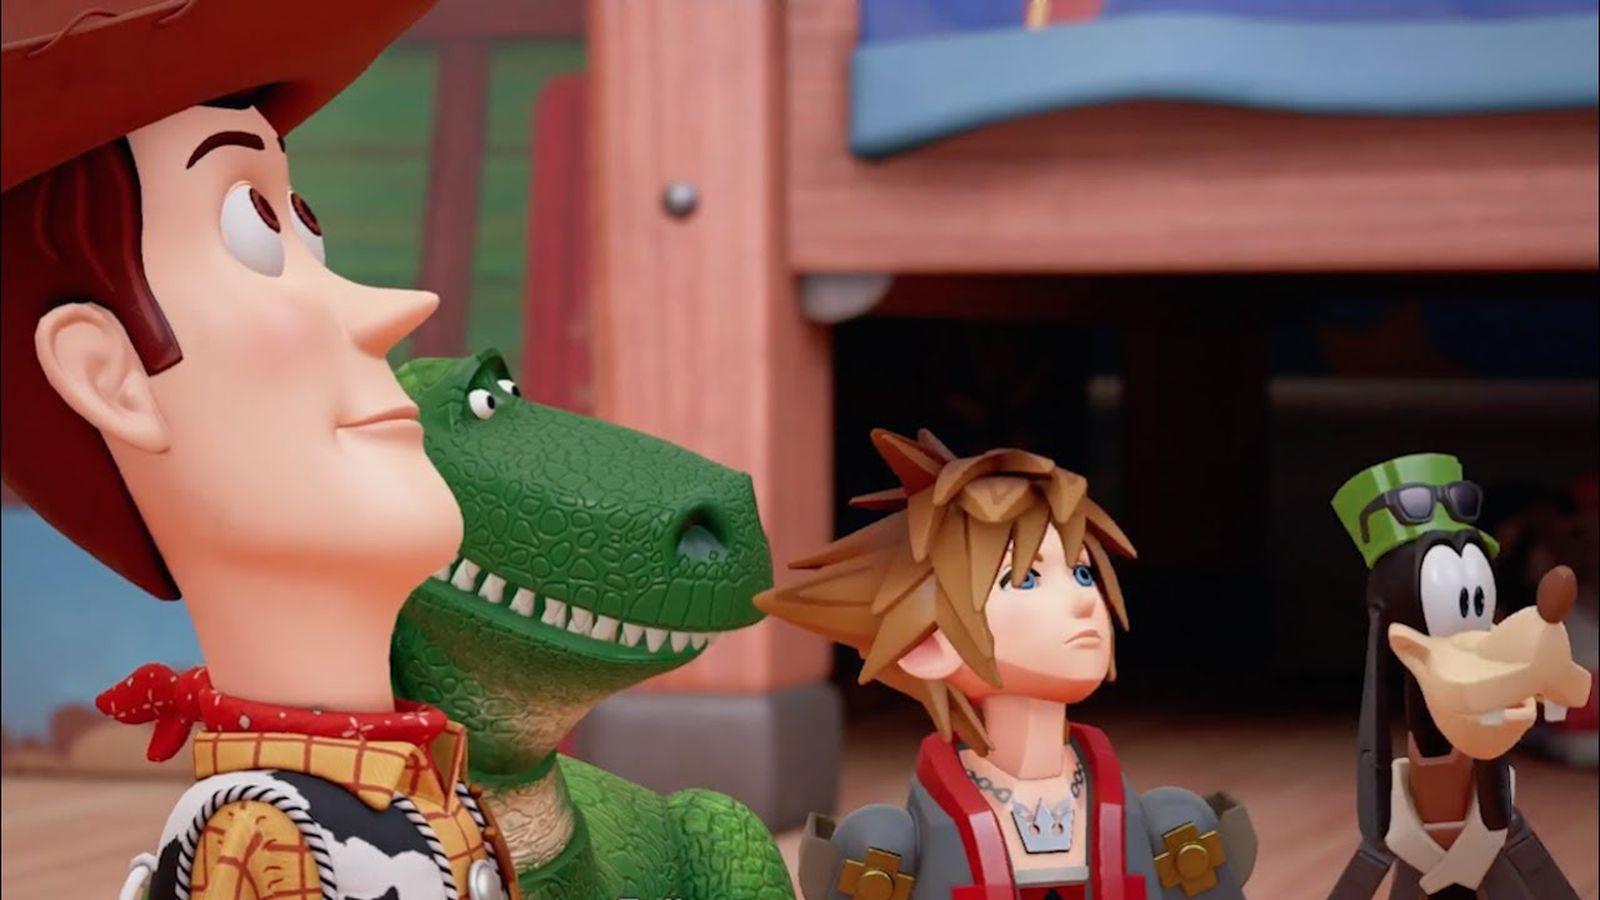 Kingdom Hearts 3 makes good on PlayStation's apocryphal promise